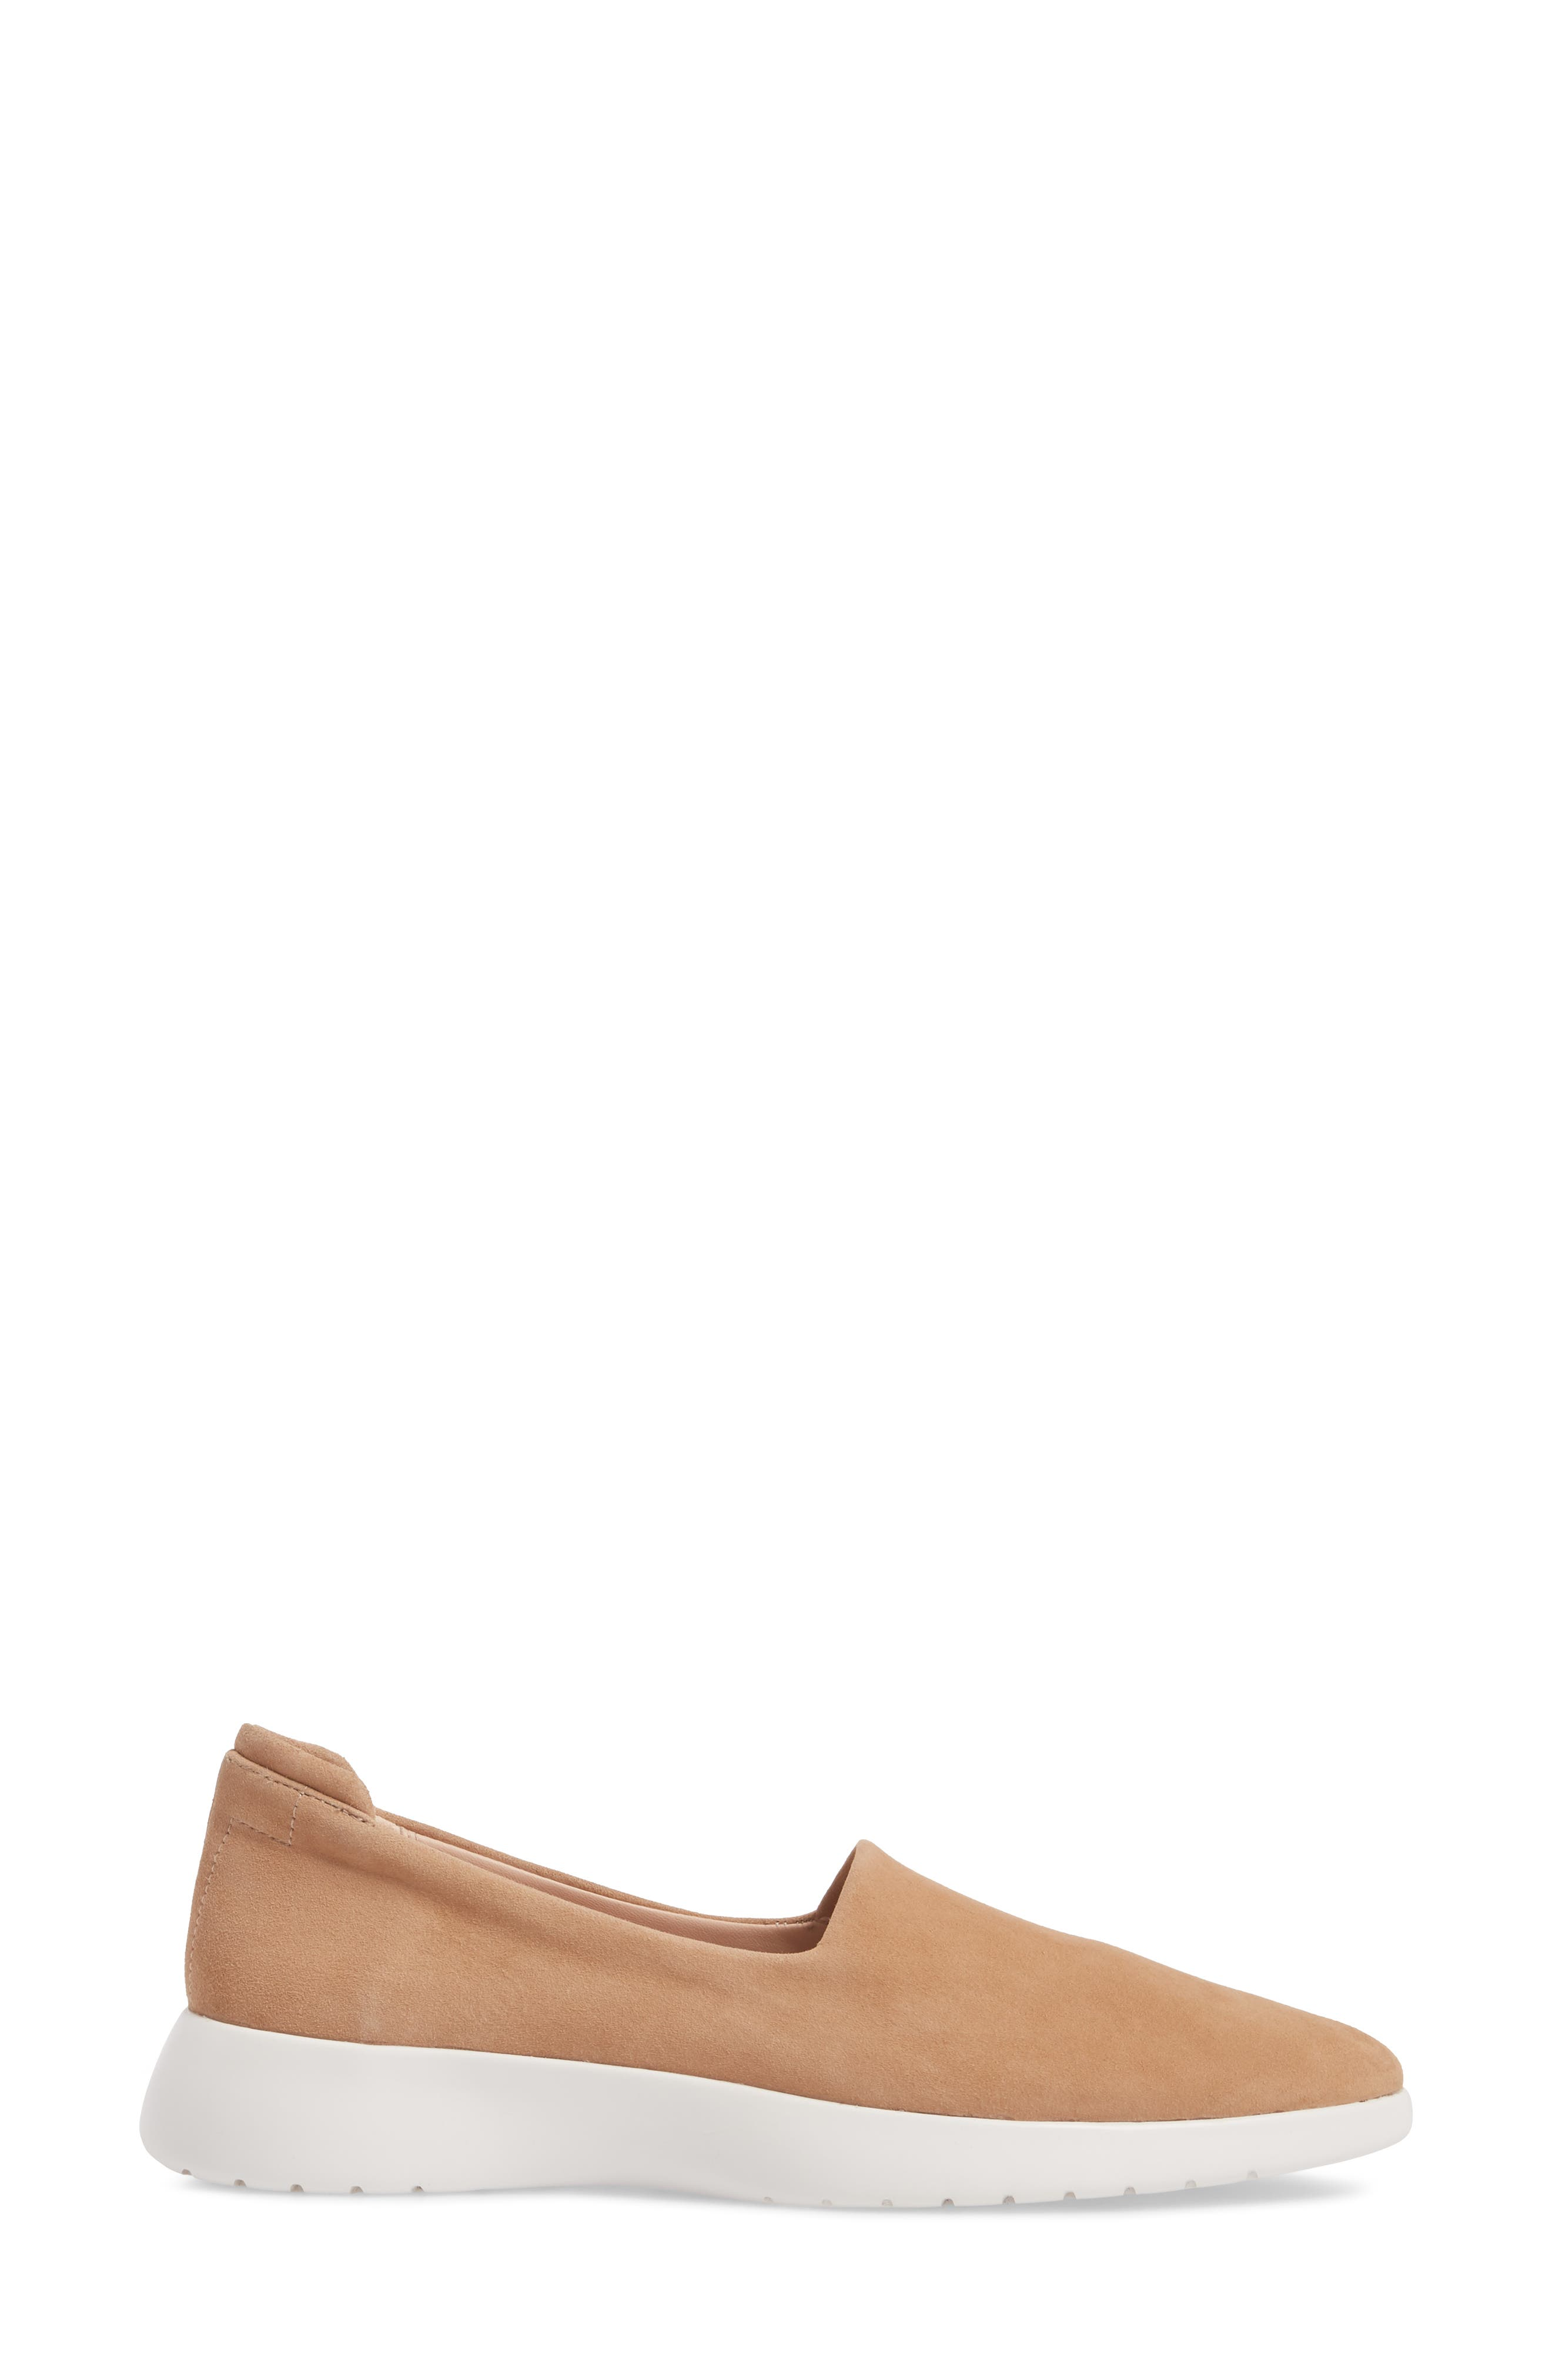 Darla Slip-On Sneaker,                             Alternate thumbnail 3, color,                             SOFT BEIGE SUEDE